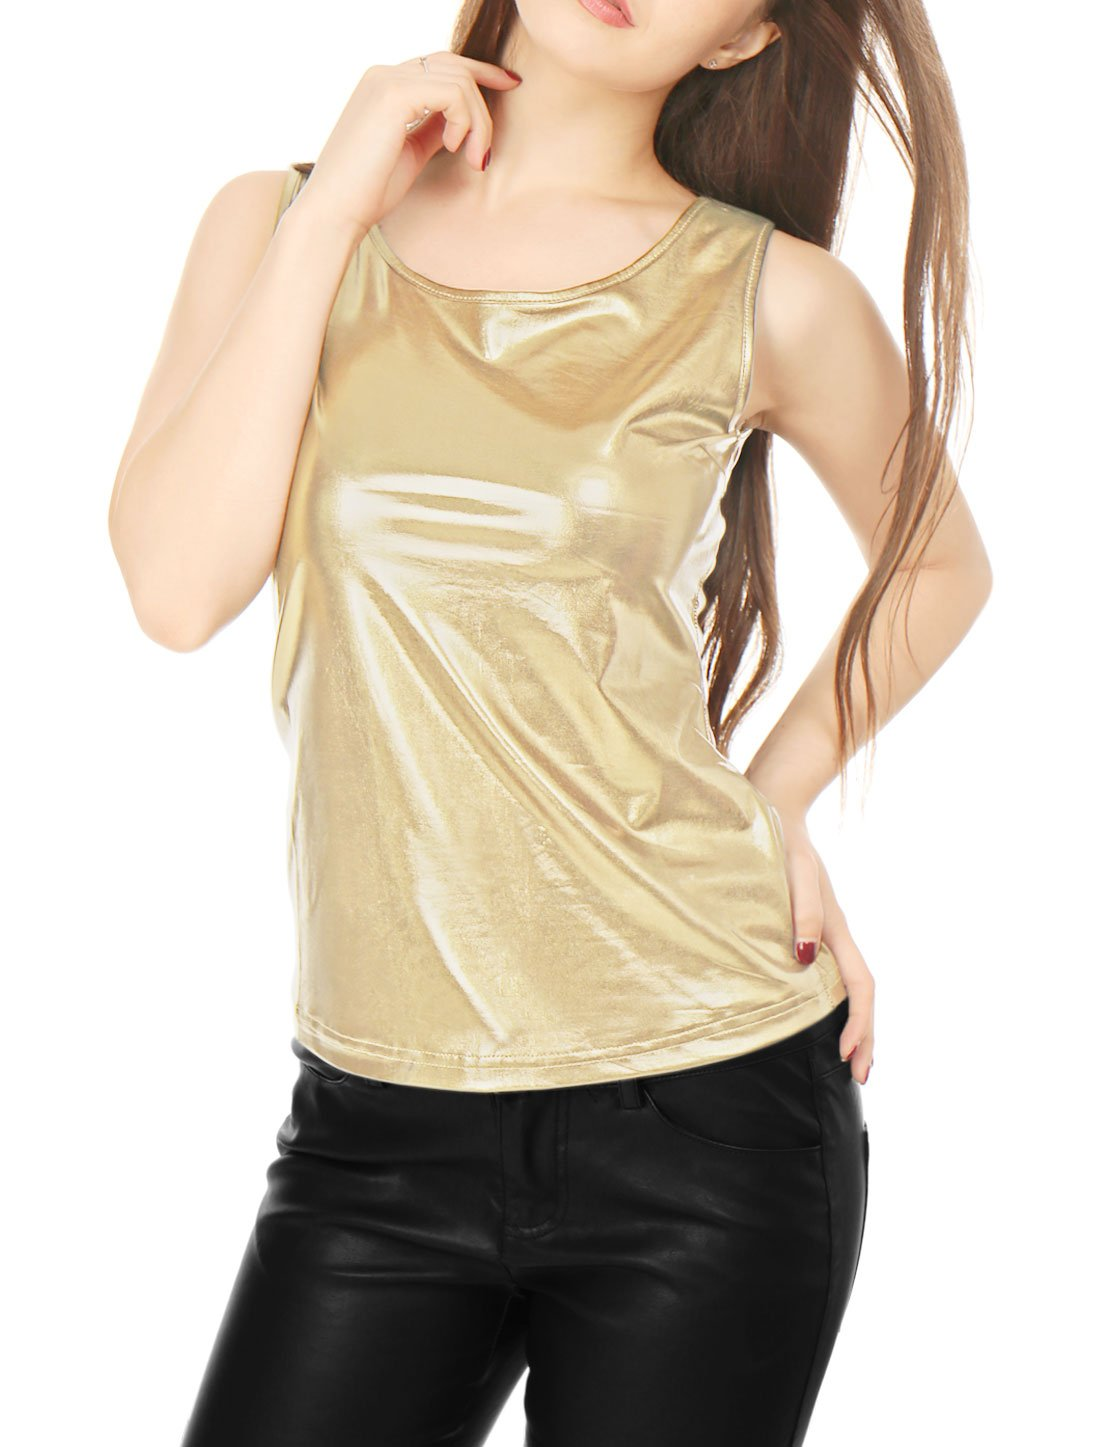 3b2eb3c4cba2c4 Galleon - Allegra K Women s U Neck Stretchy Slim Fit Metallic Tank Top Gold  XL (US 18)